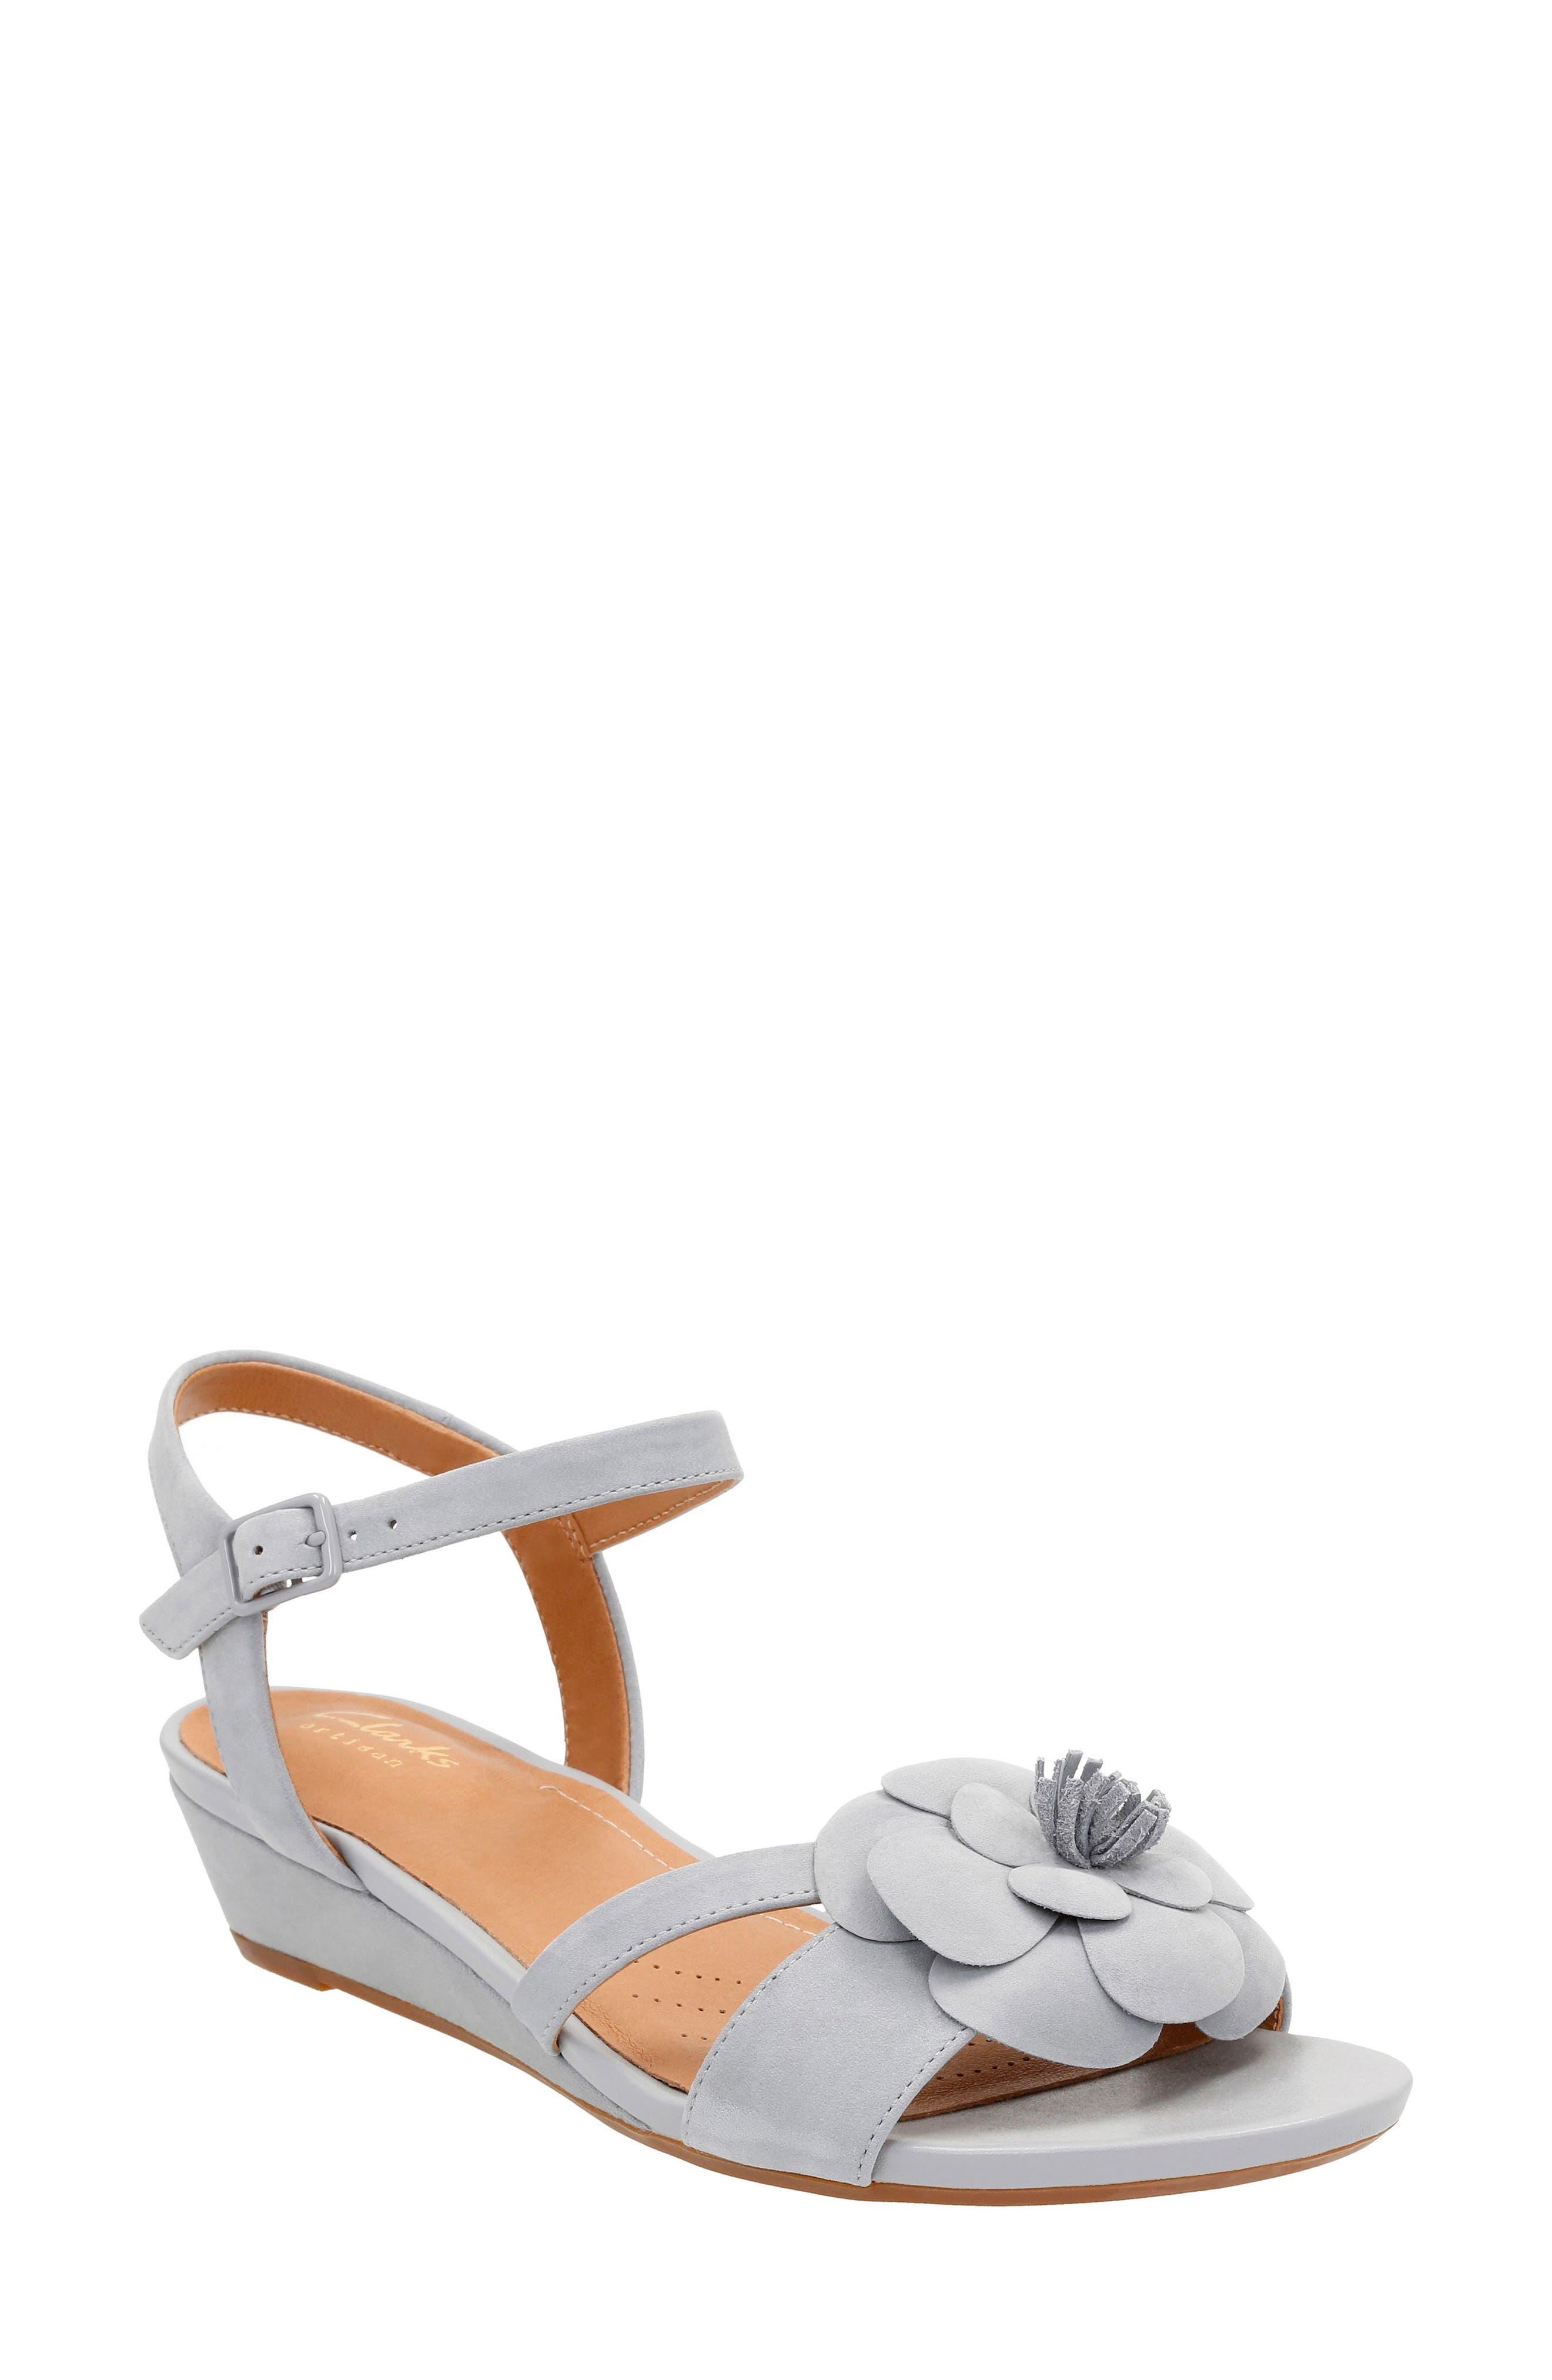 Main Image - Clarks® Parram Stella Flower Wedge Sandal (Women)